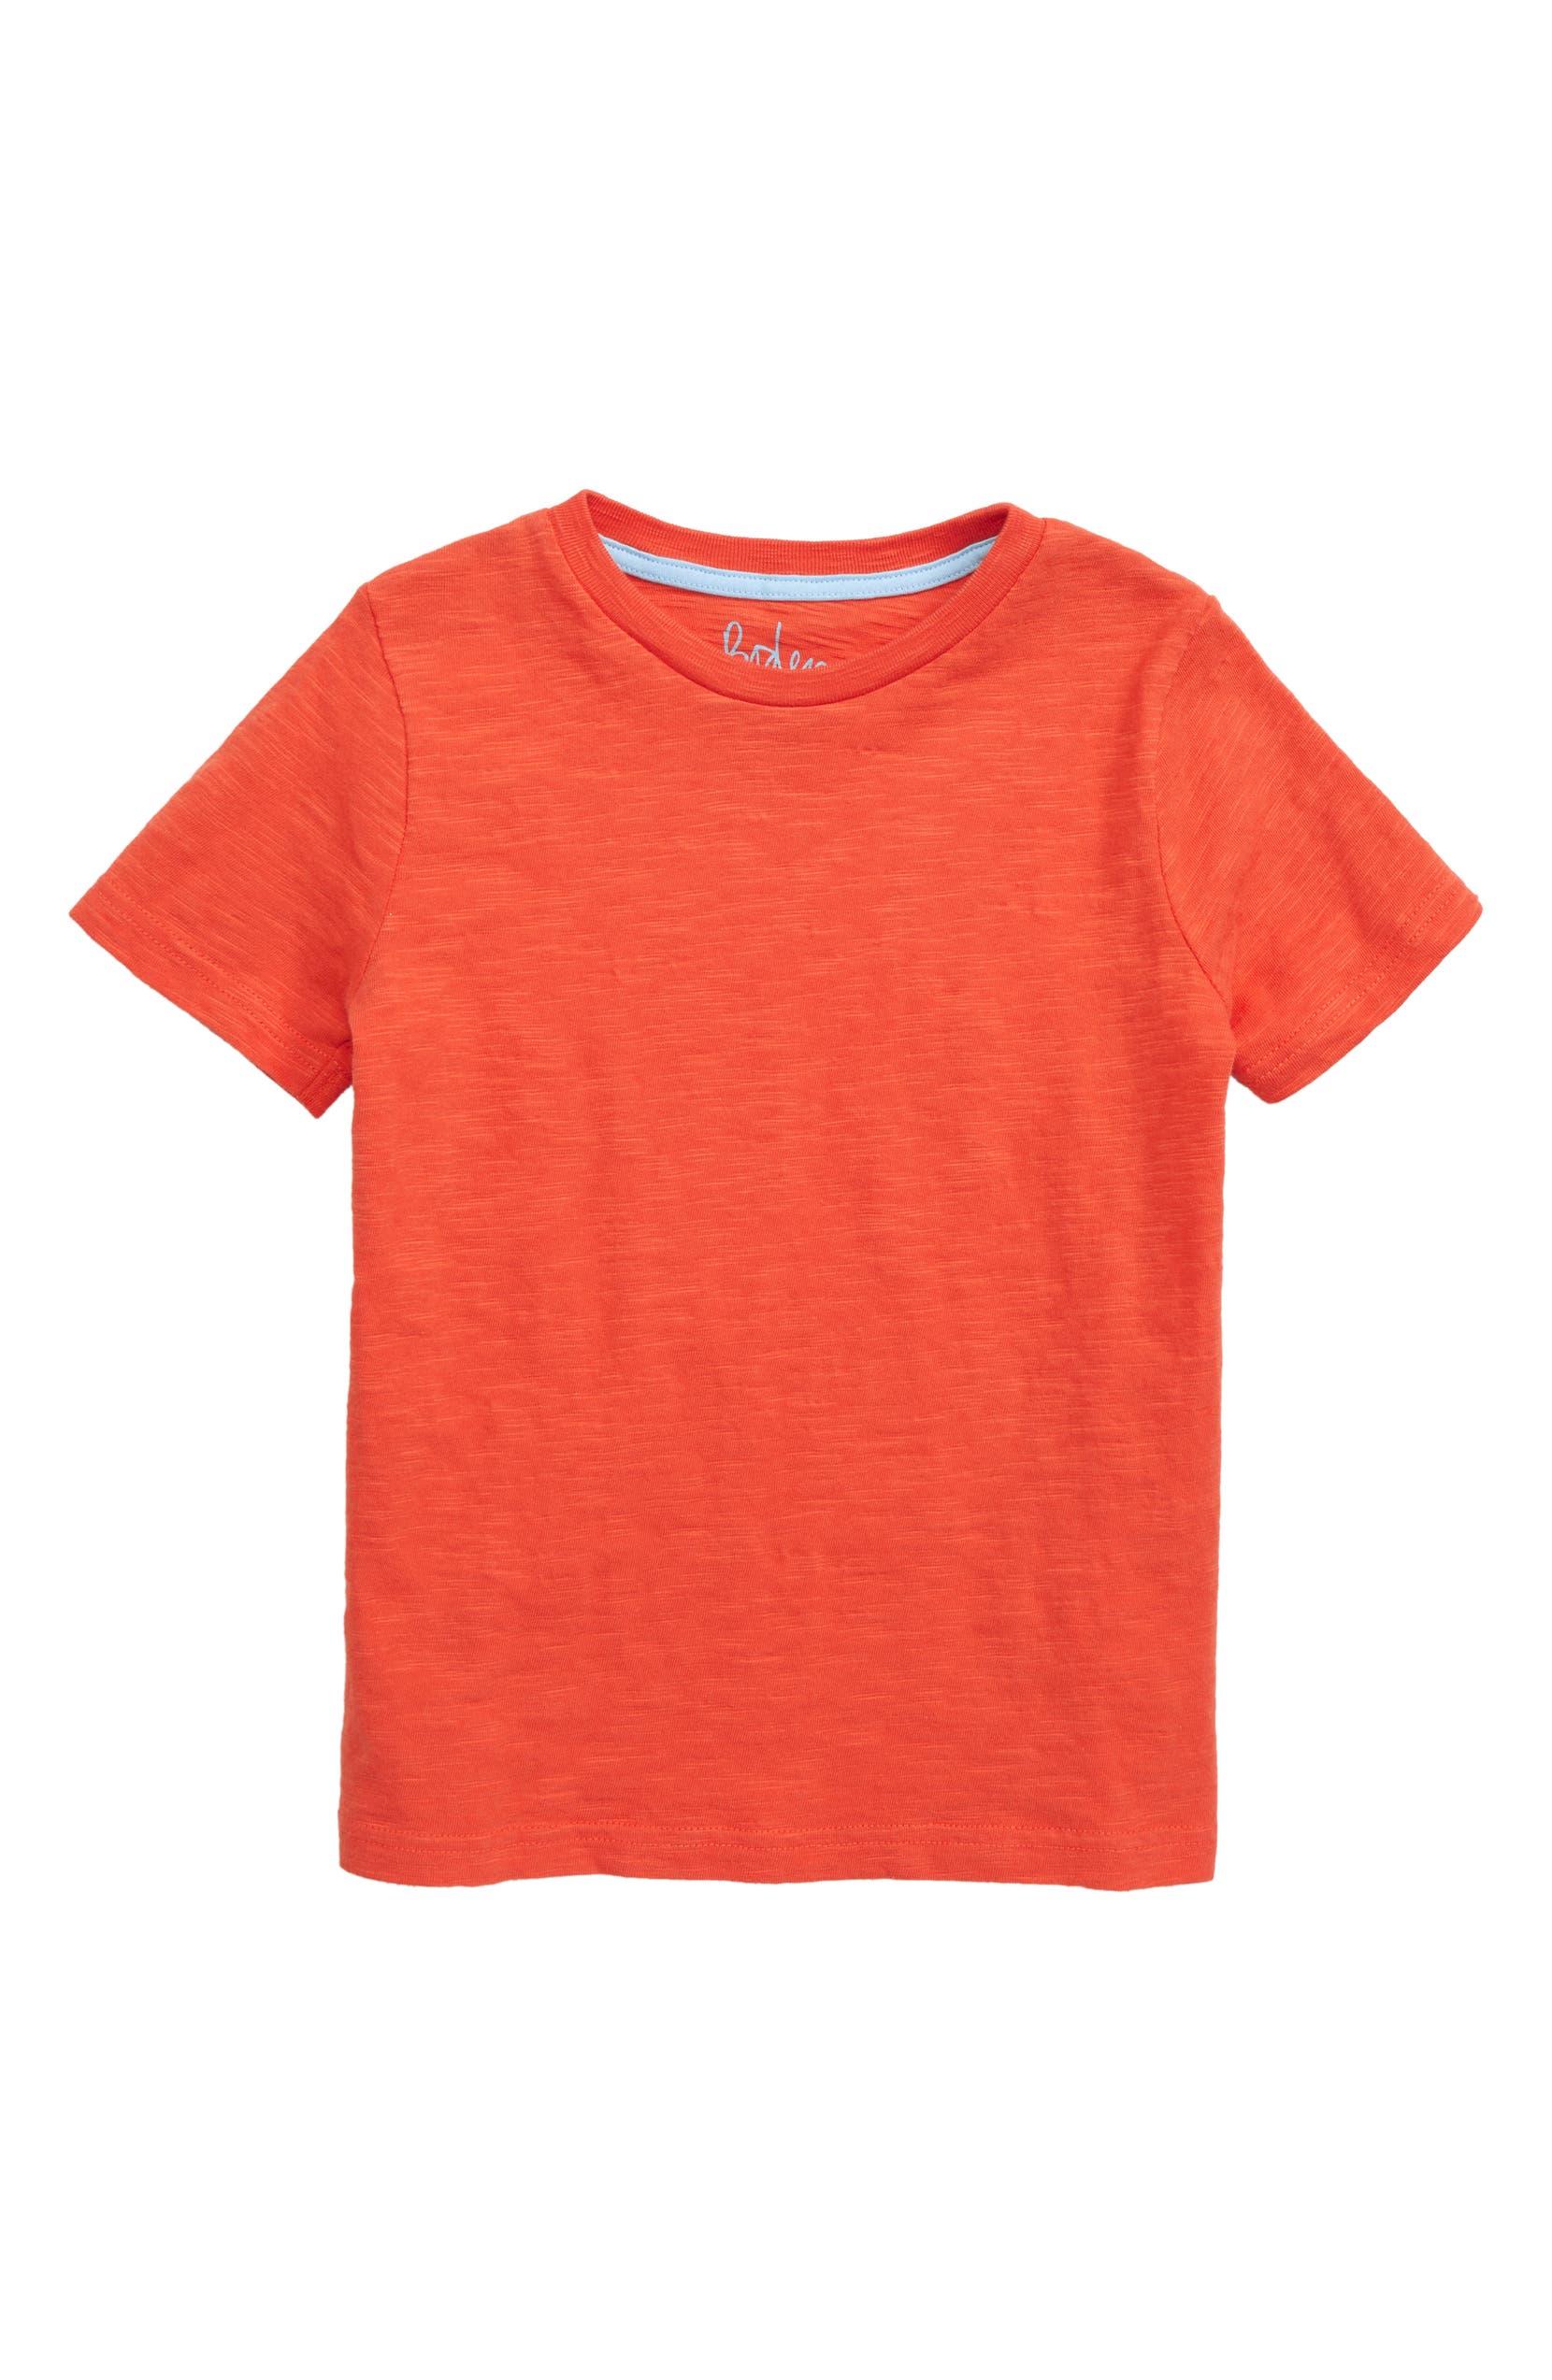 Mini Boden Stripe Slub Knit T Shirt Toddler Boys Little